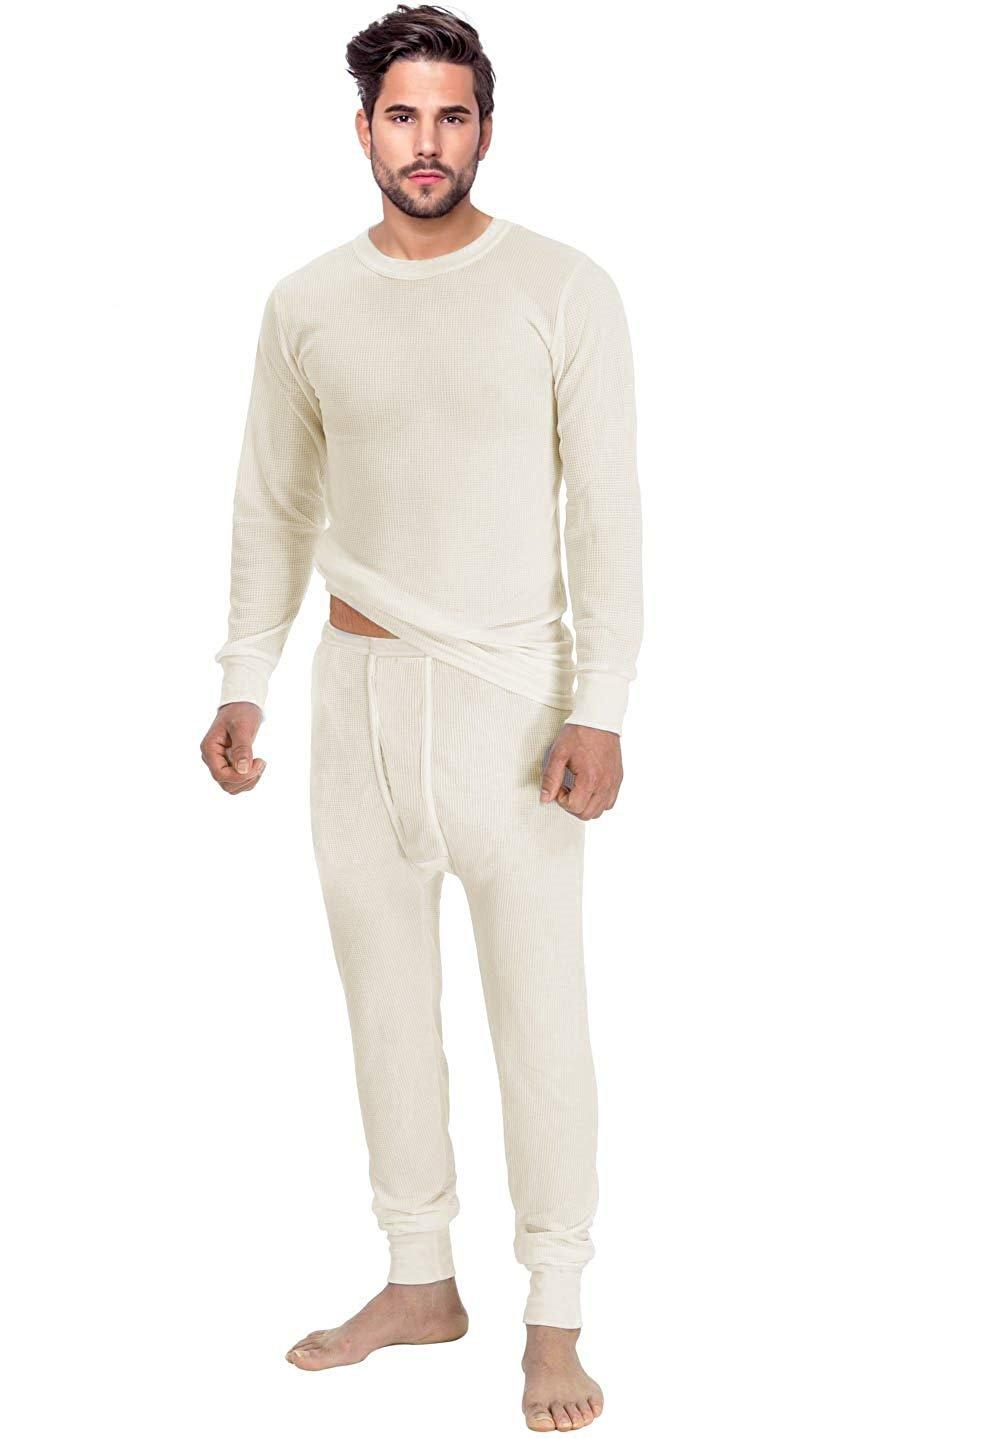 Rocky Men's Thermal 2pc Set Long John Underwear Ultra Soft waffle X-Large Natural